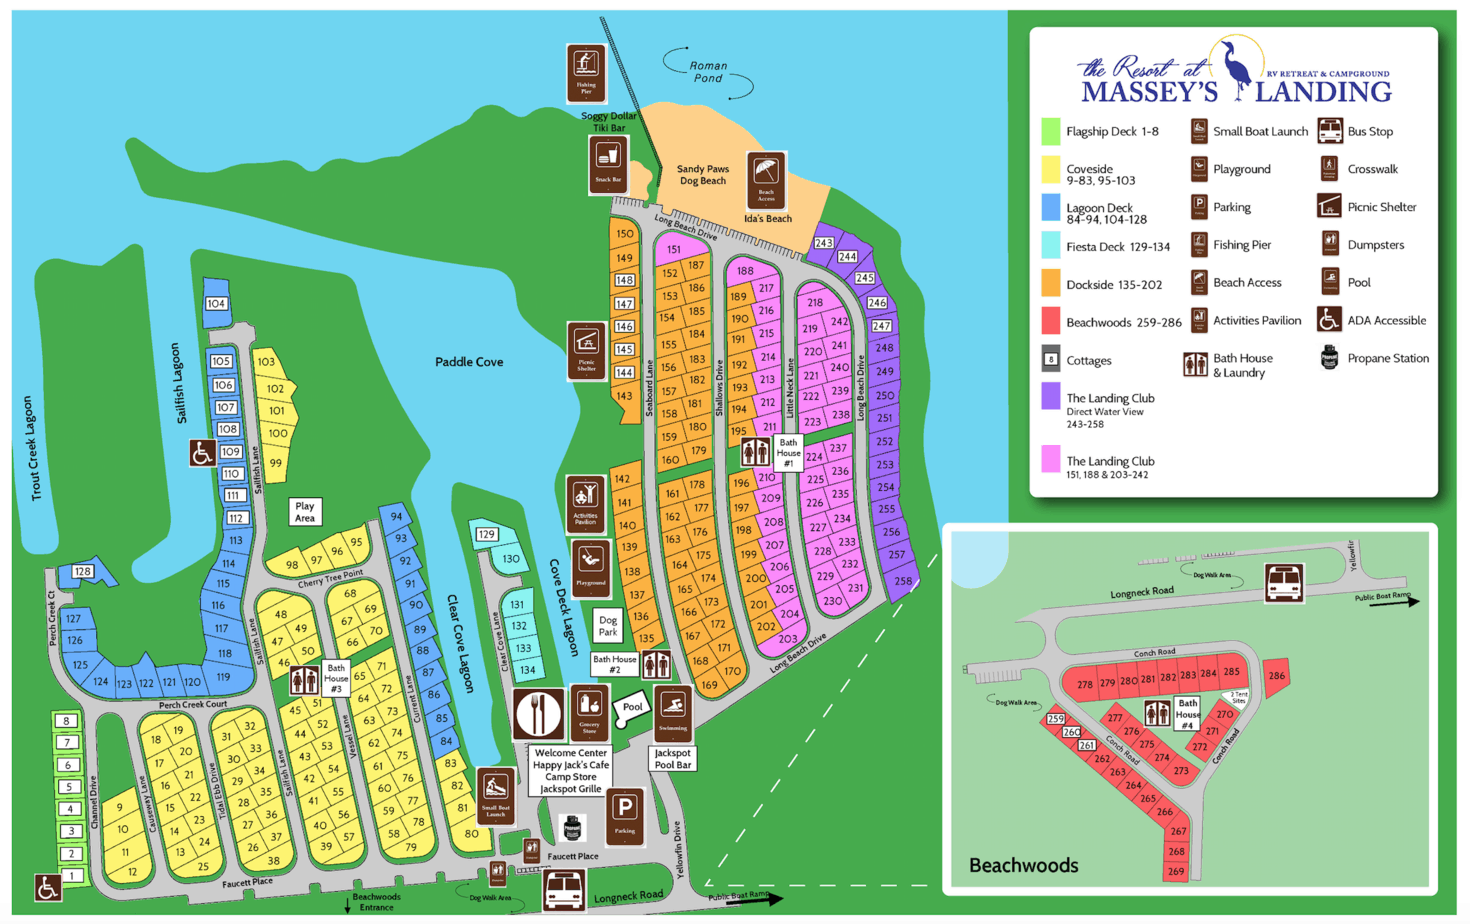 Map of Massey's Landing